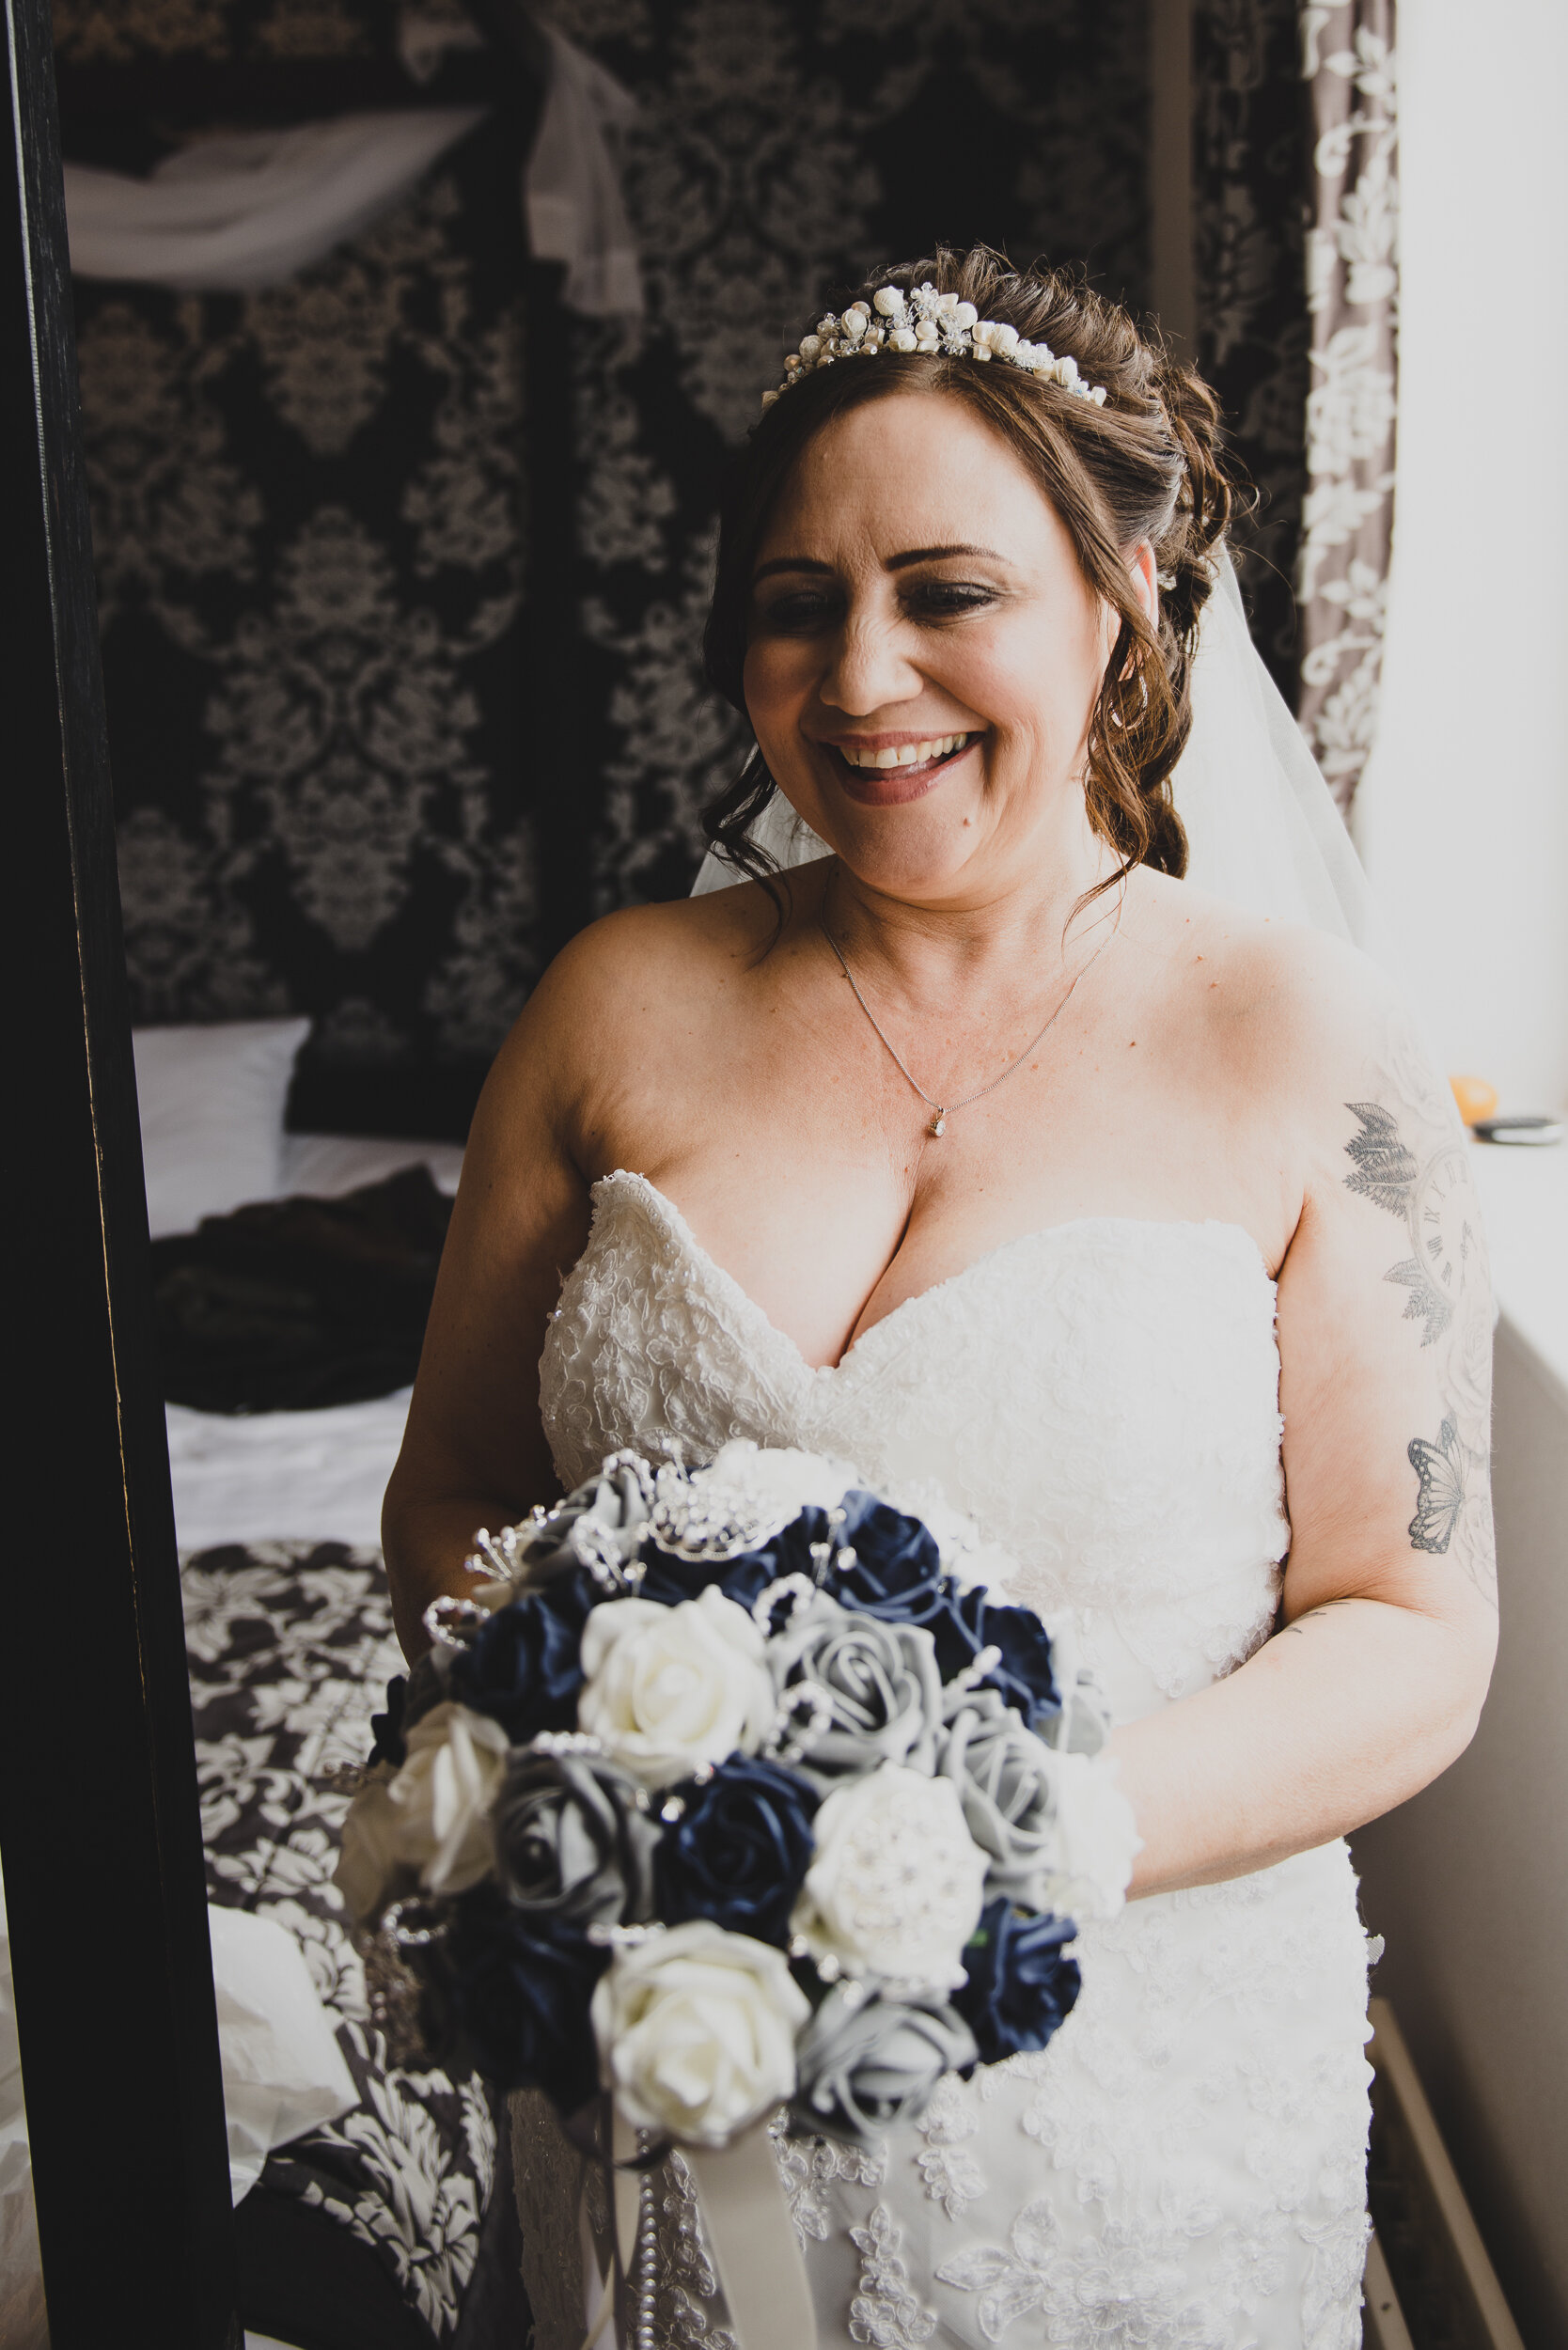 Heaton_wedding_photos_Gretna-5.jpg